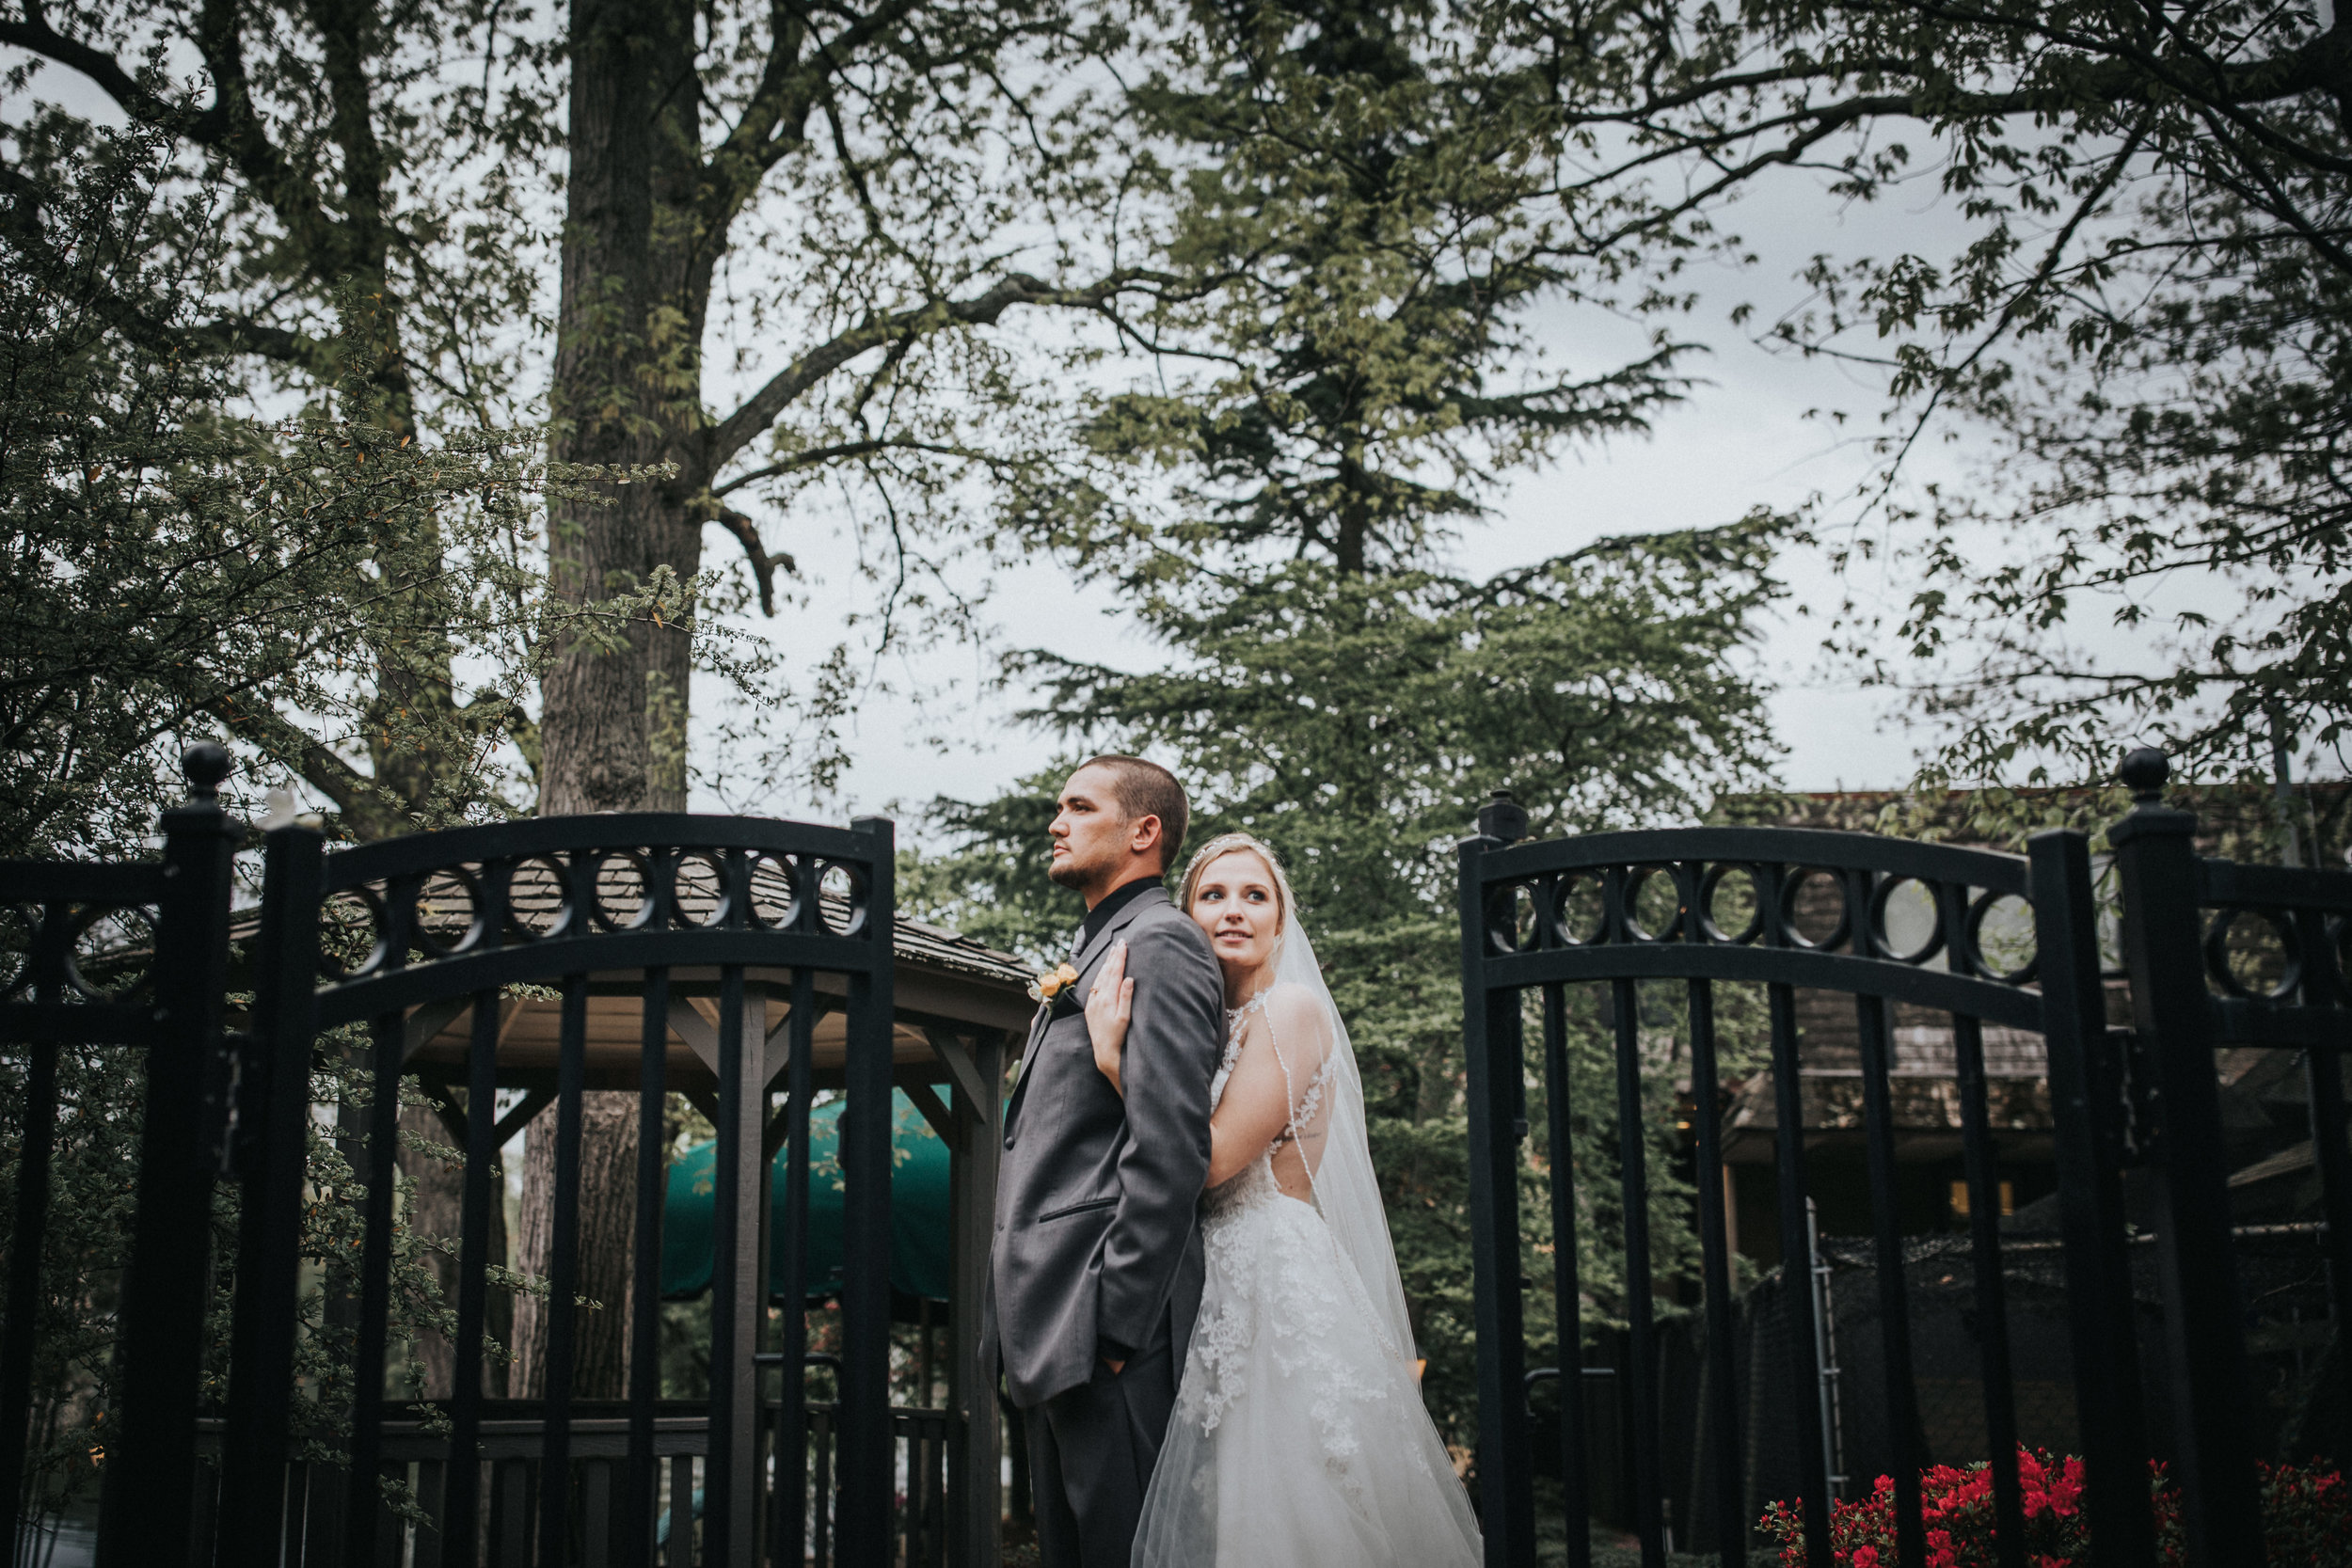 New-Jersey-Wedding-Photographer-Megan&Nick-BrideandGroom-29.jpg